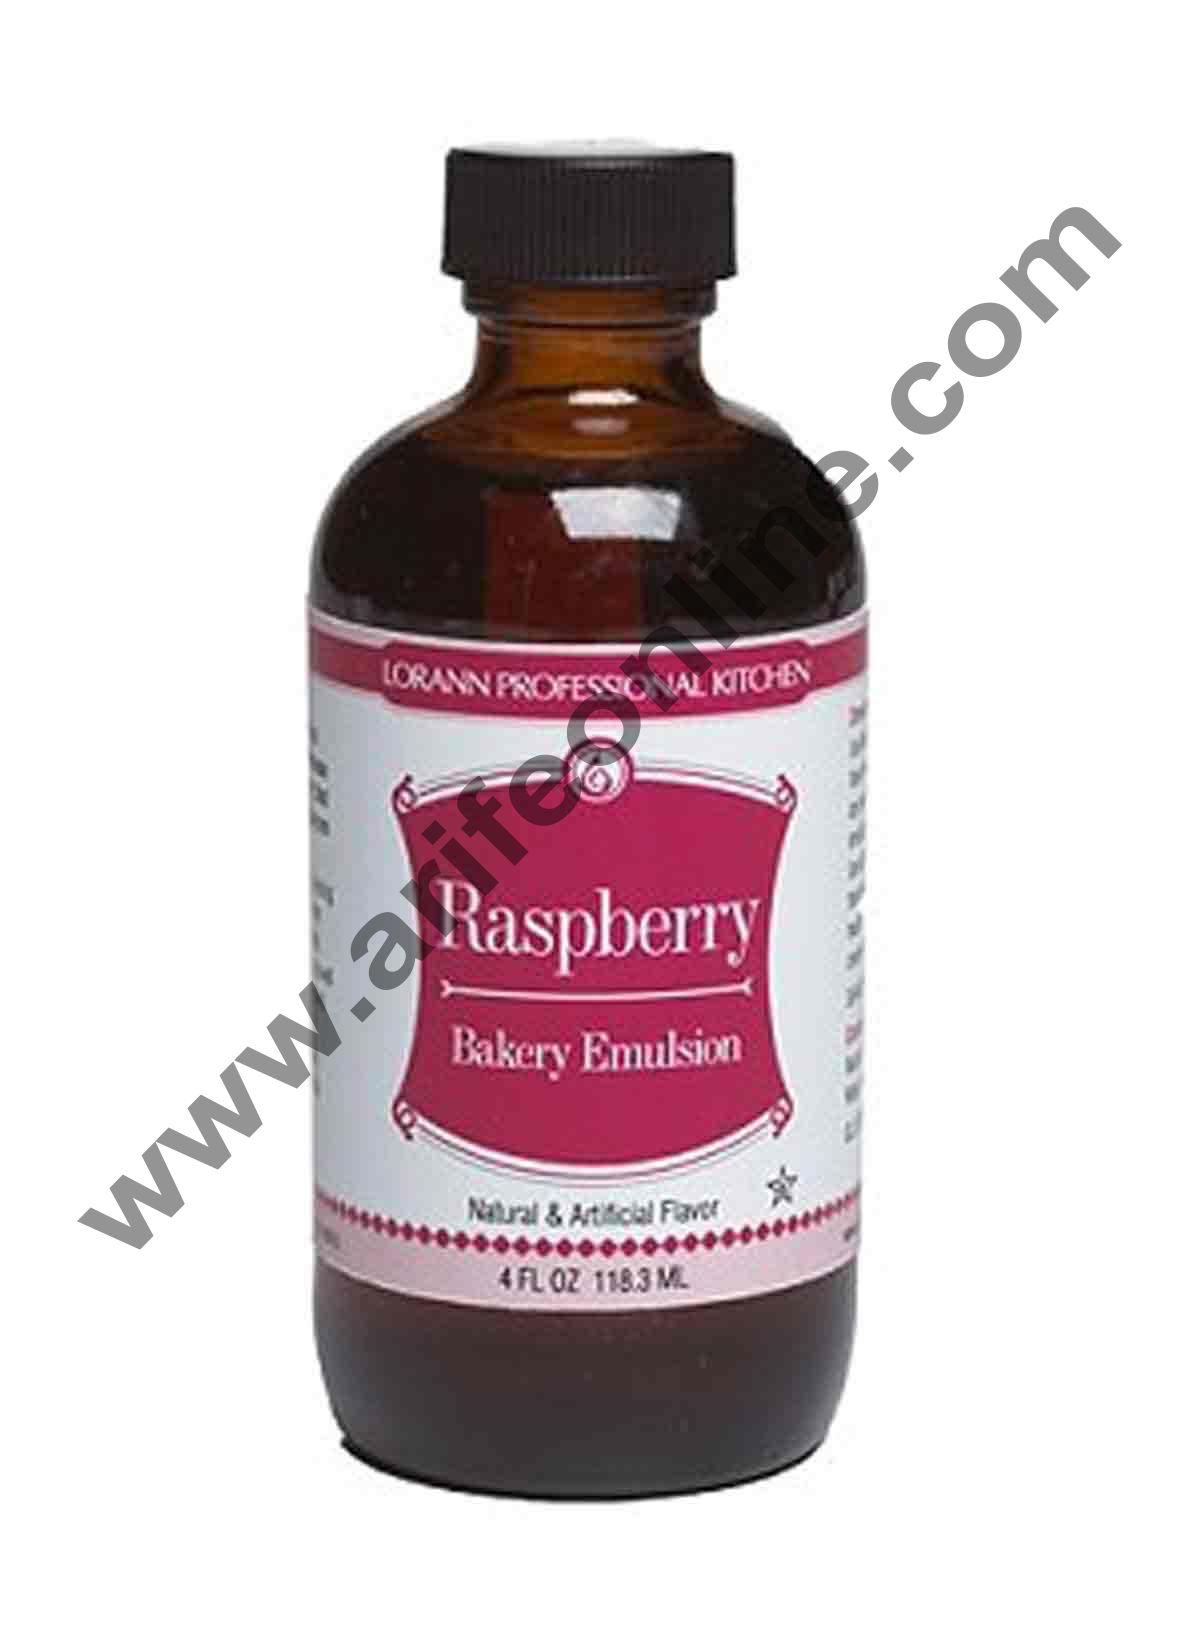 LorAnn Oils Bakery Emulsions Natural & Artificial Flavor 4 oz - Raspberry